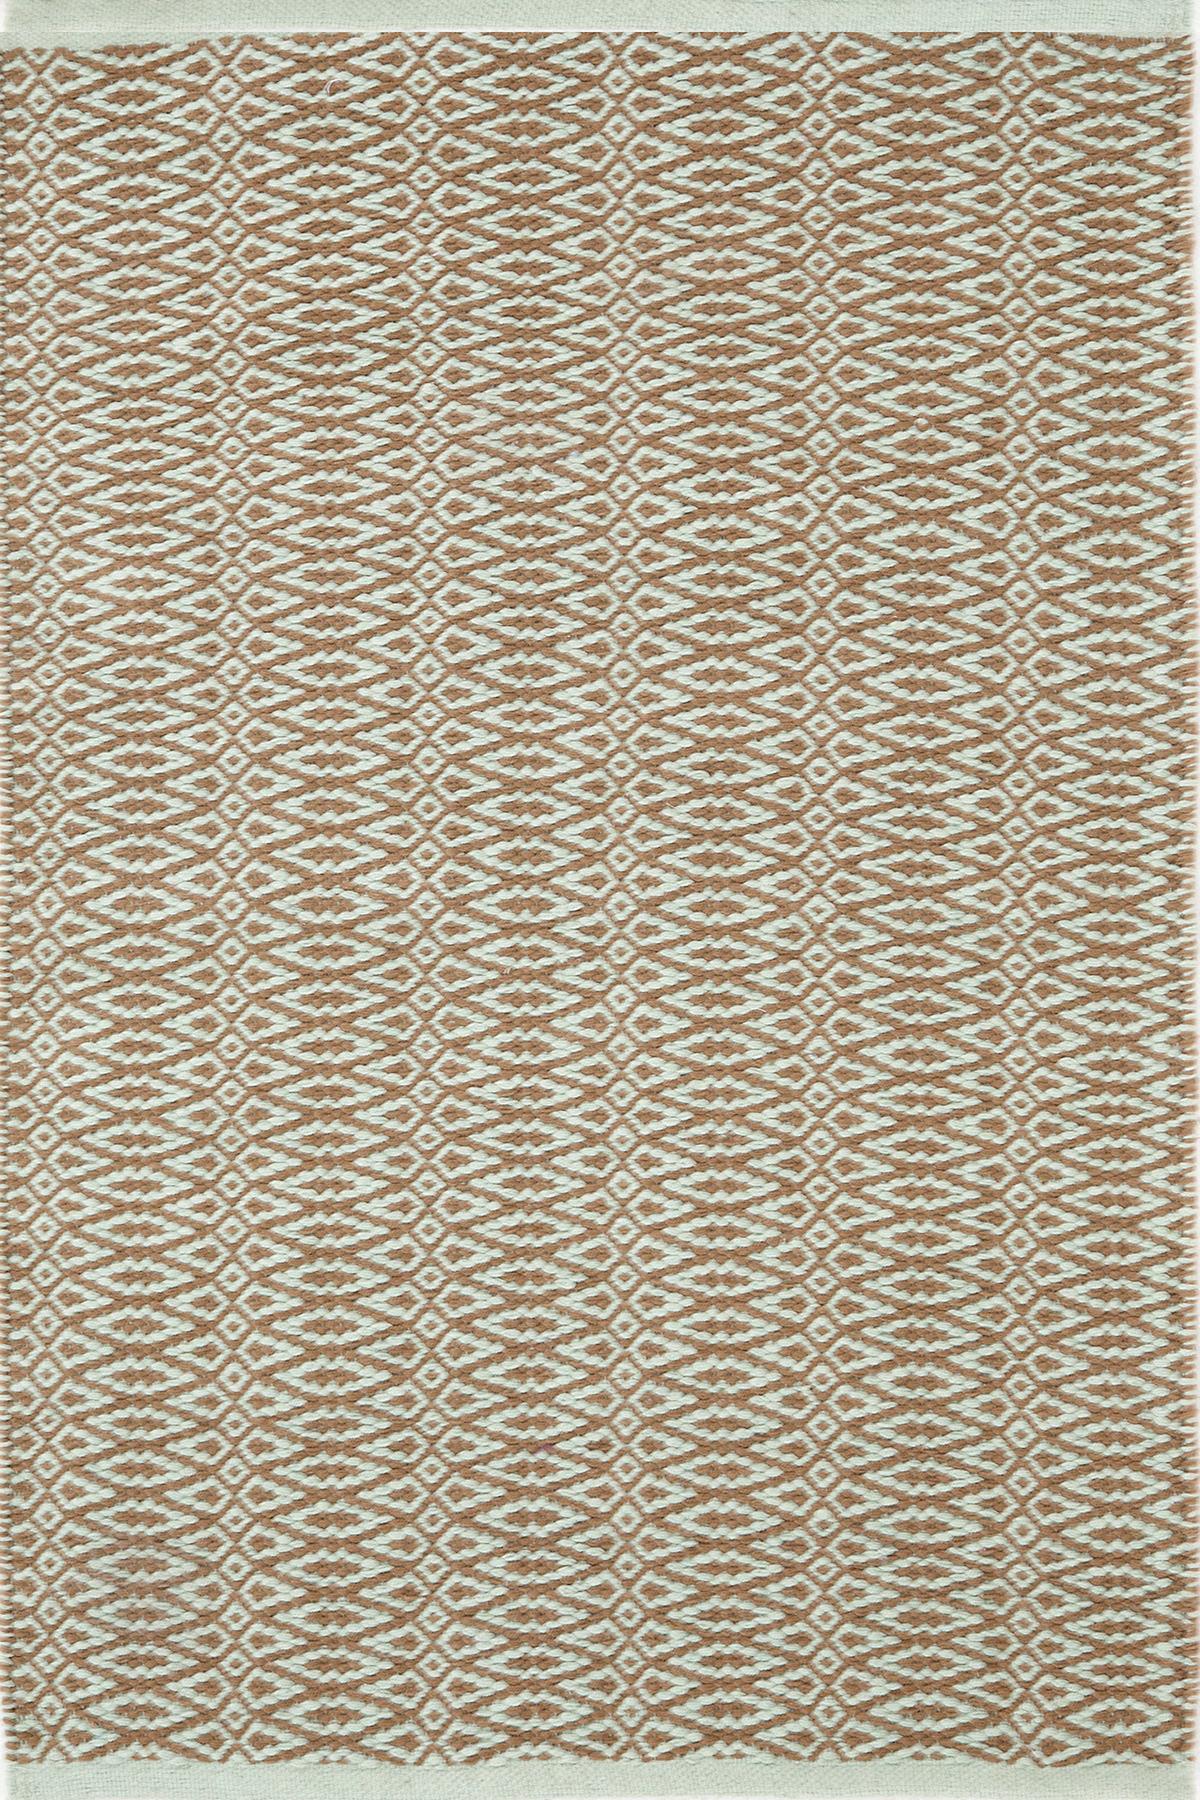 Fair Isle Ocean/Coffee Cotton Woven Rug | The Outlet